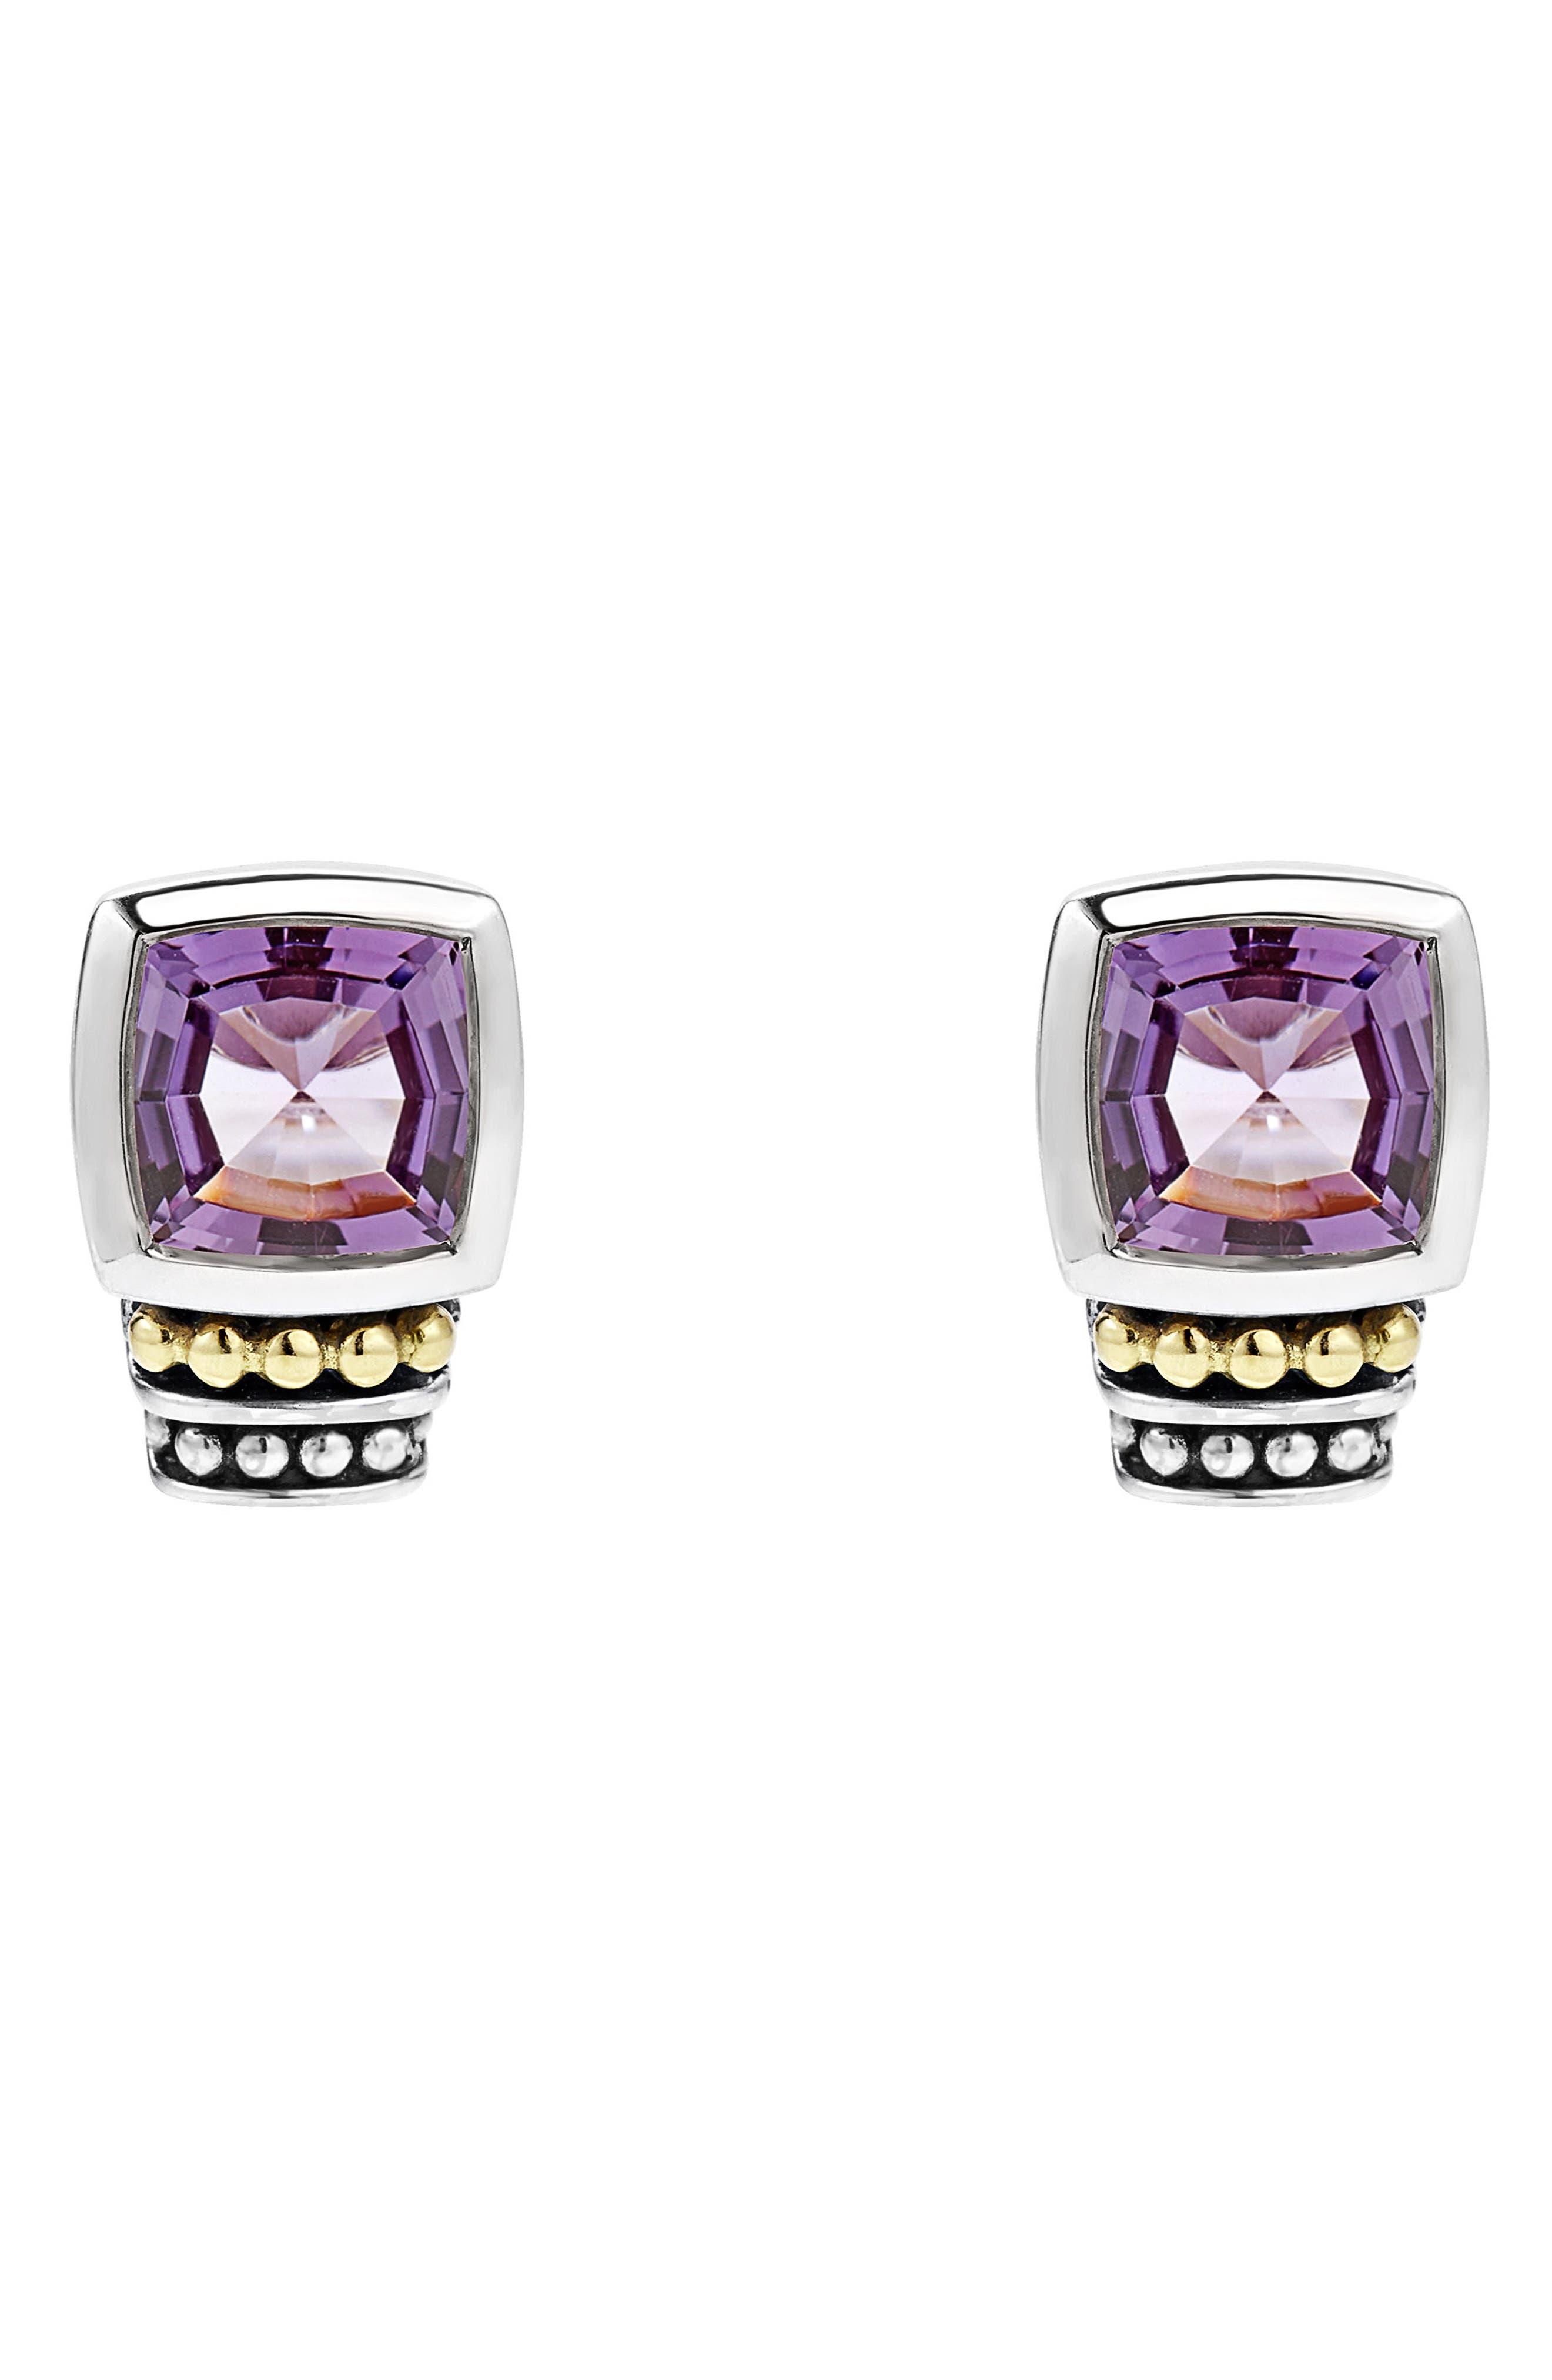 'Caviar Color' Semiprecious Stone Stud Earrings,                         Main,                         color, Amethyst